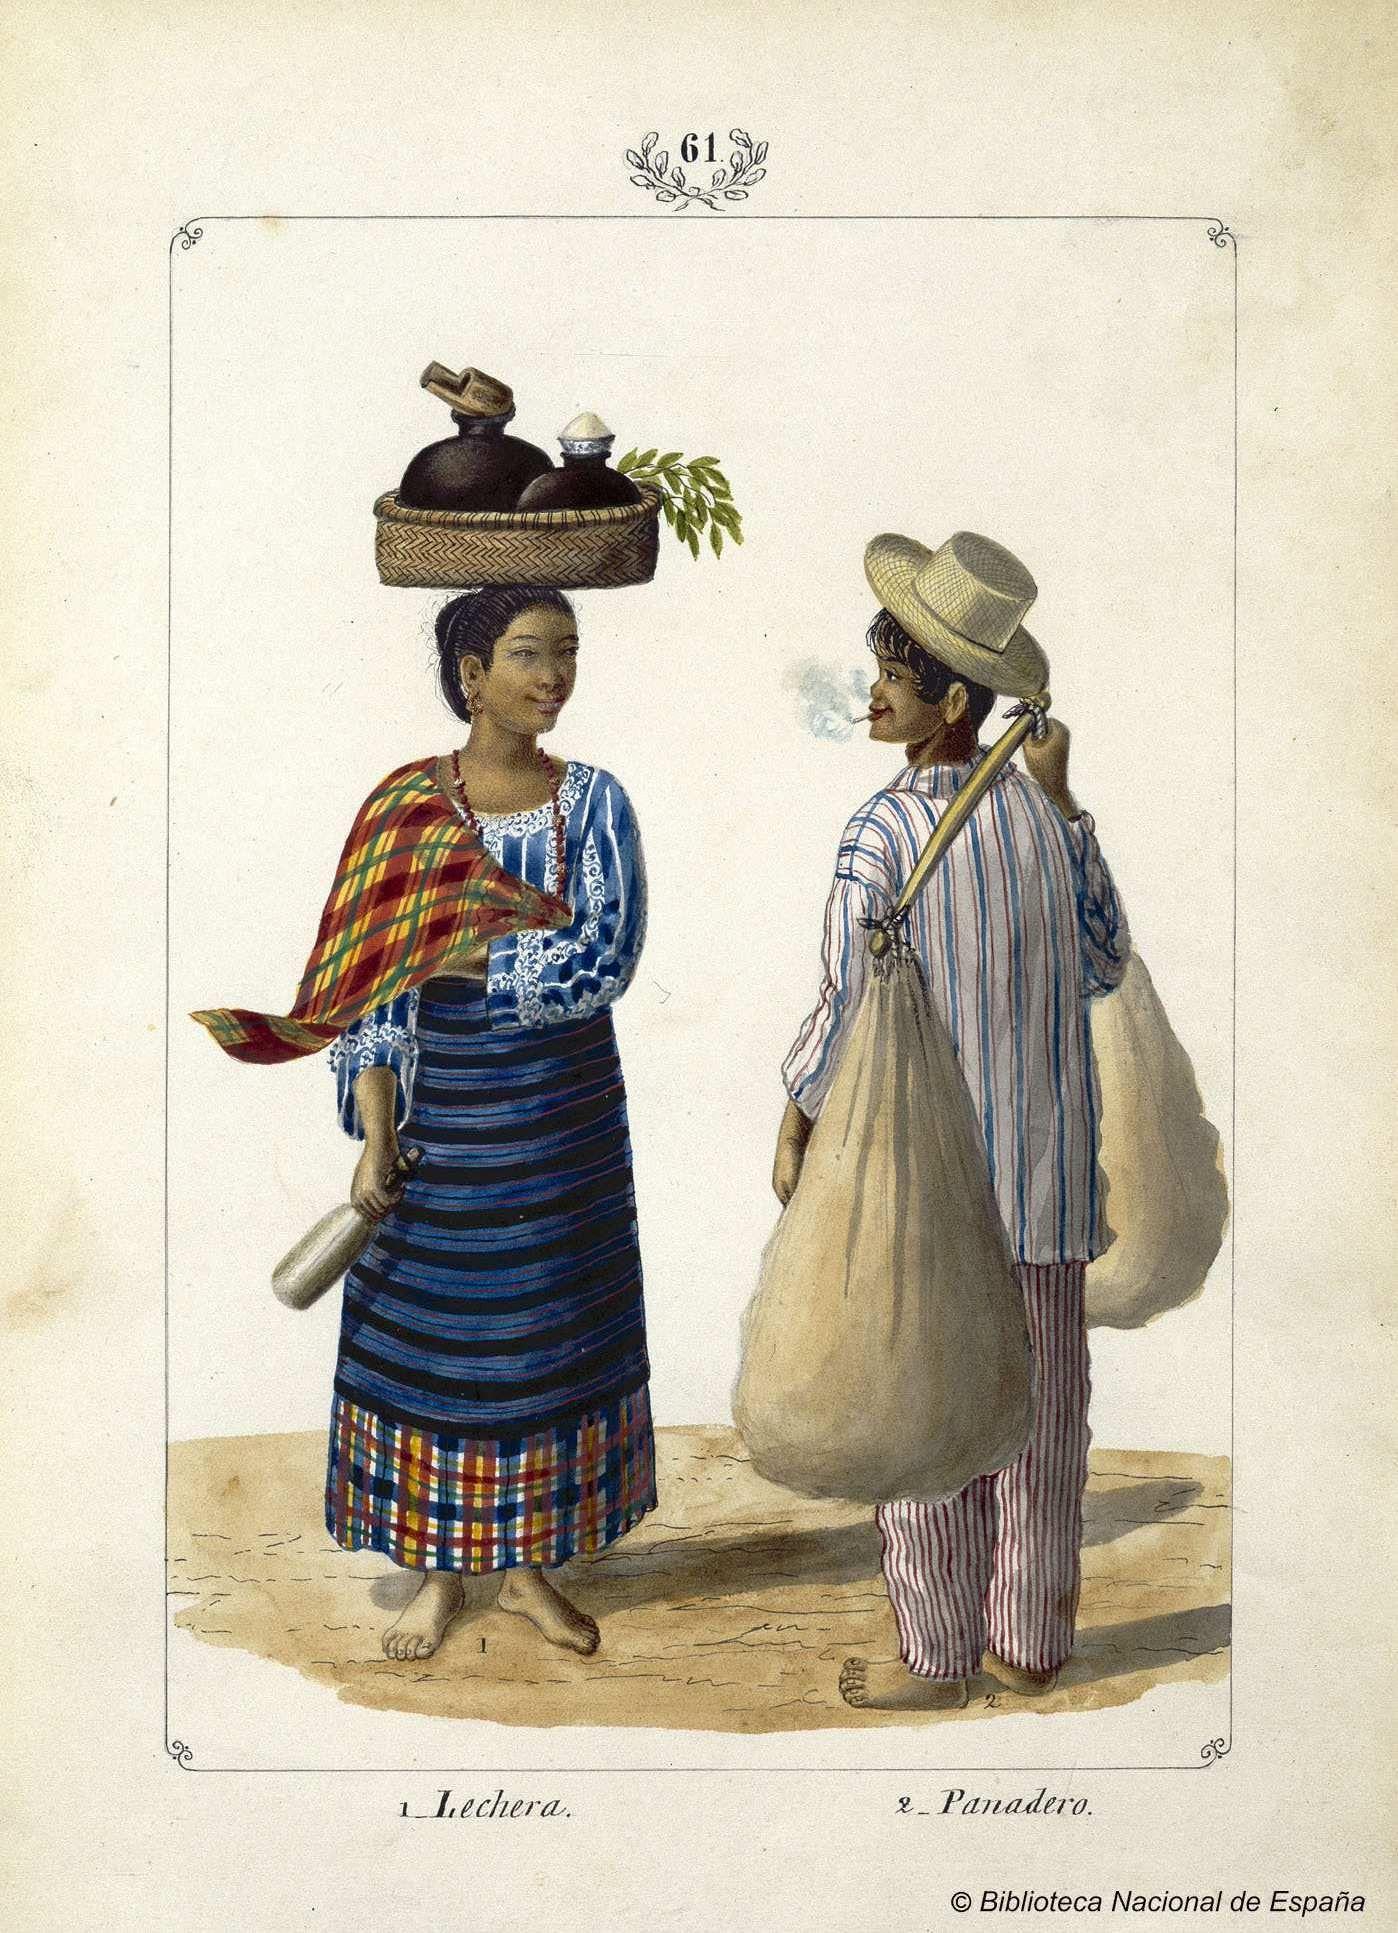 [Lechera y Panadero]. Lozano, José Honorato 1821- — Dibujo — 1847